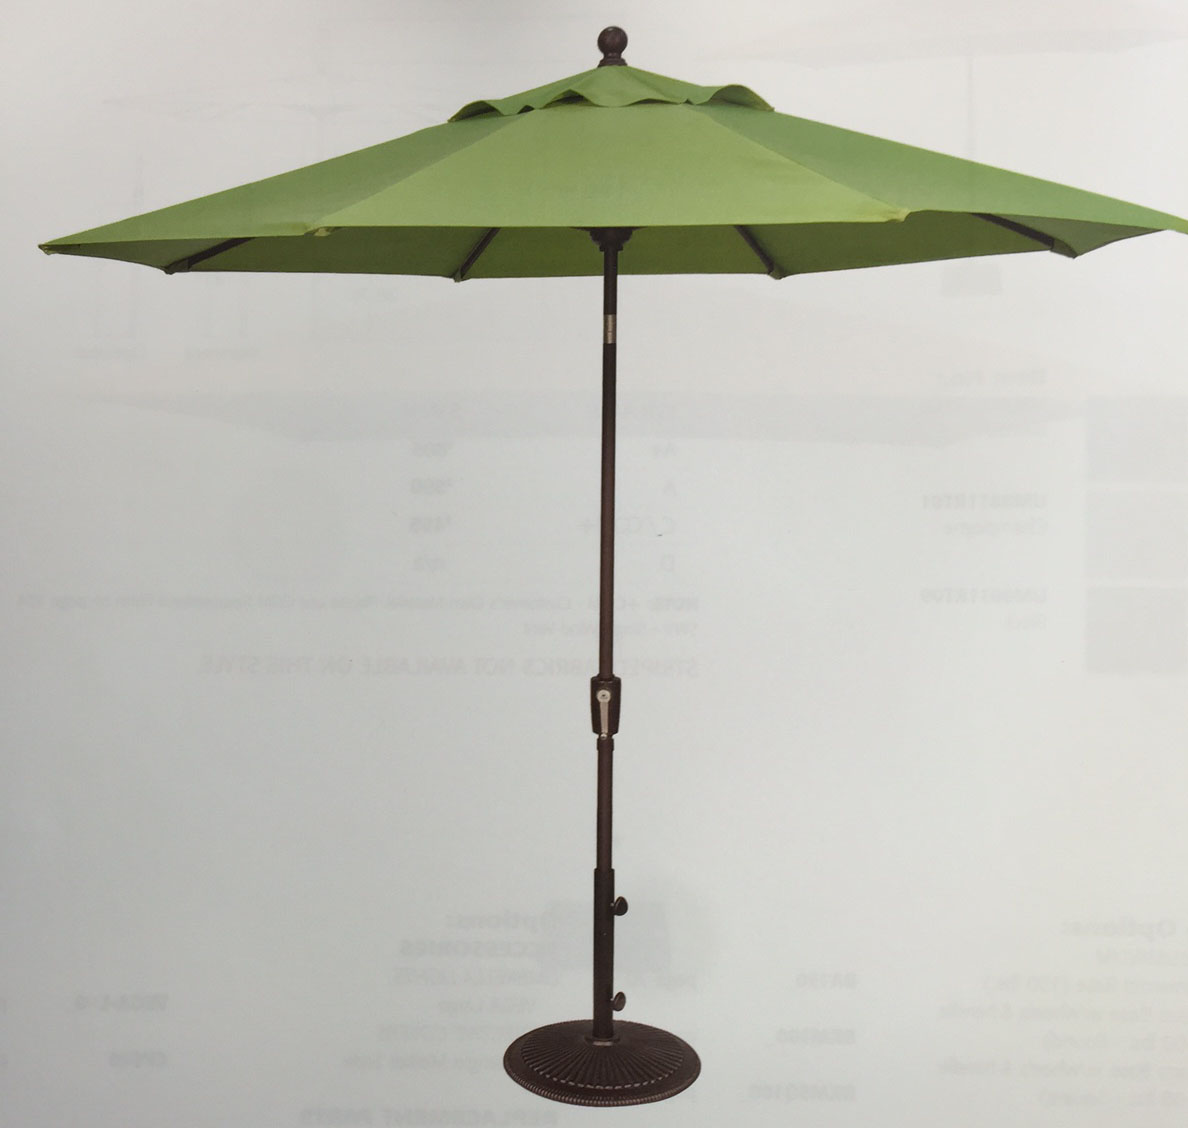 Sale 9ft Octagonal Umbrella Sunbrella Fabric Oceanic